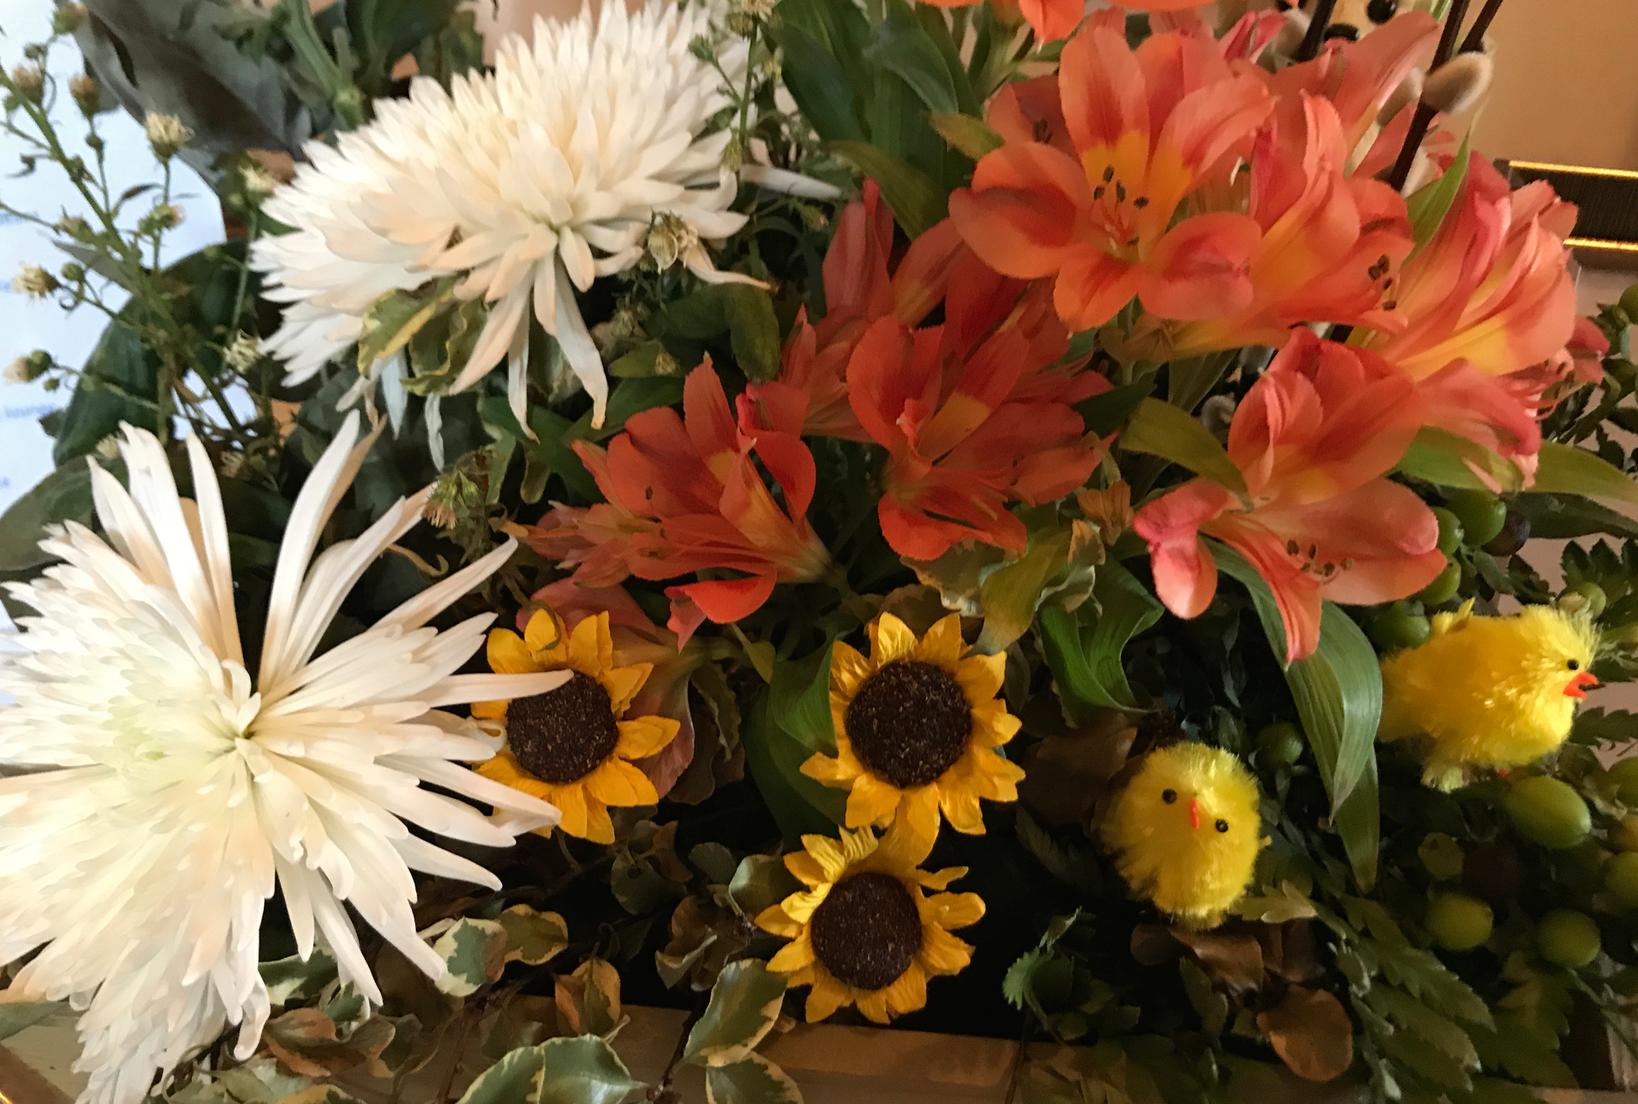 Easter chicks in spring flowers